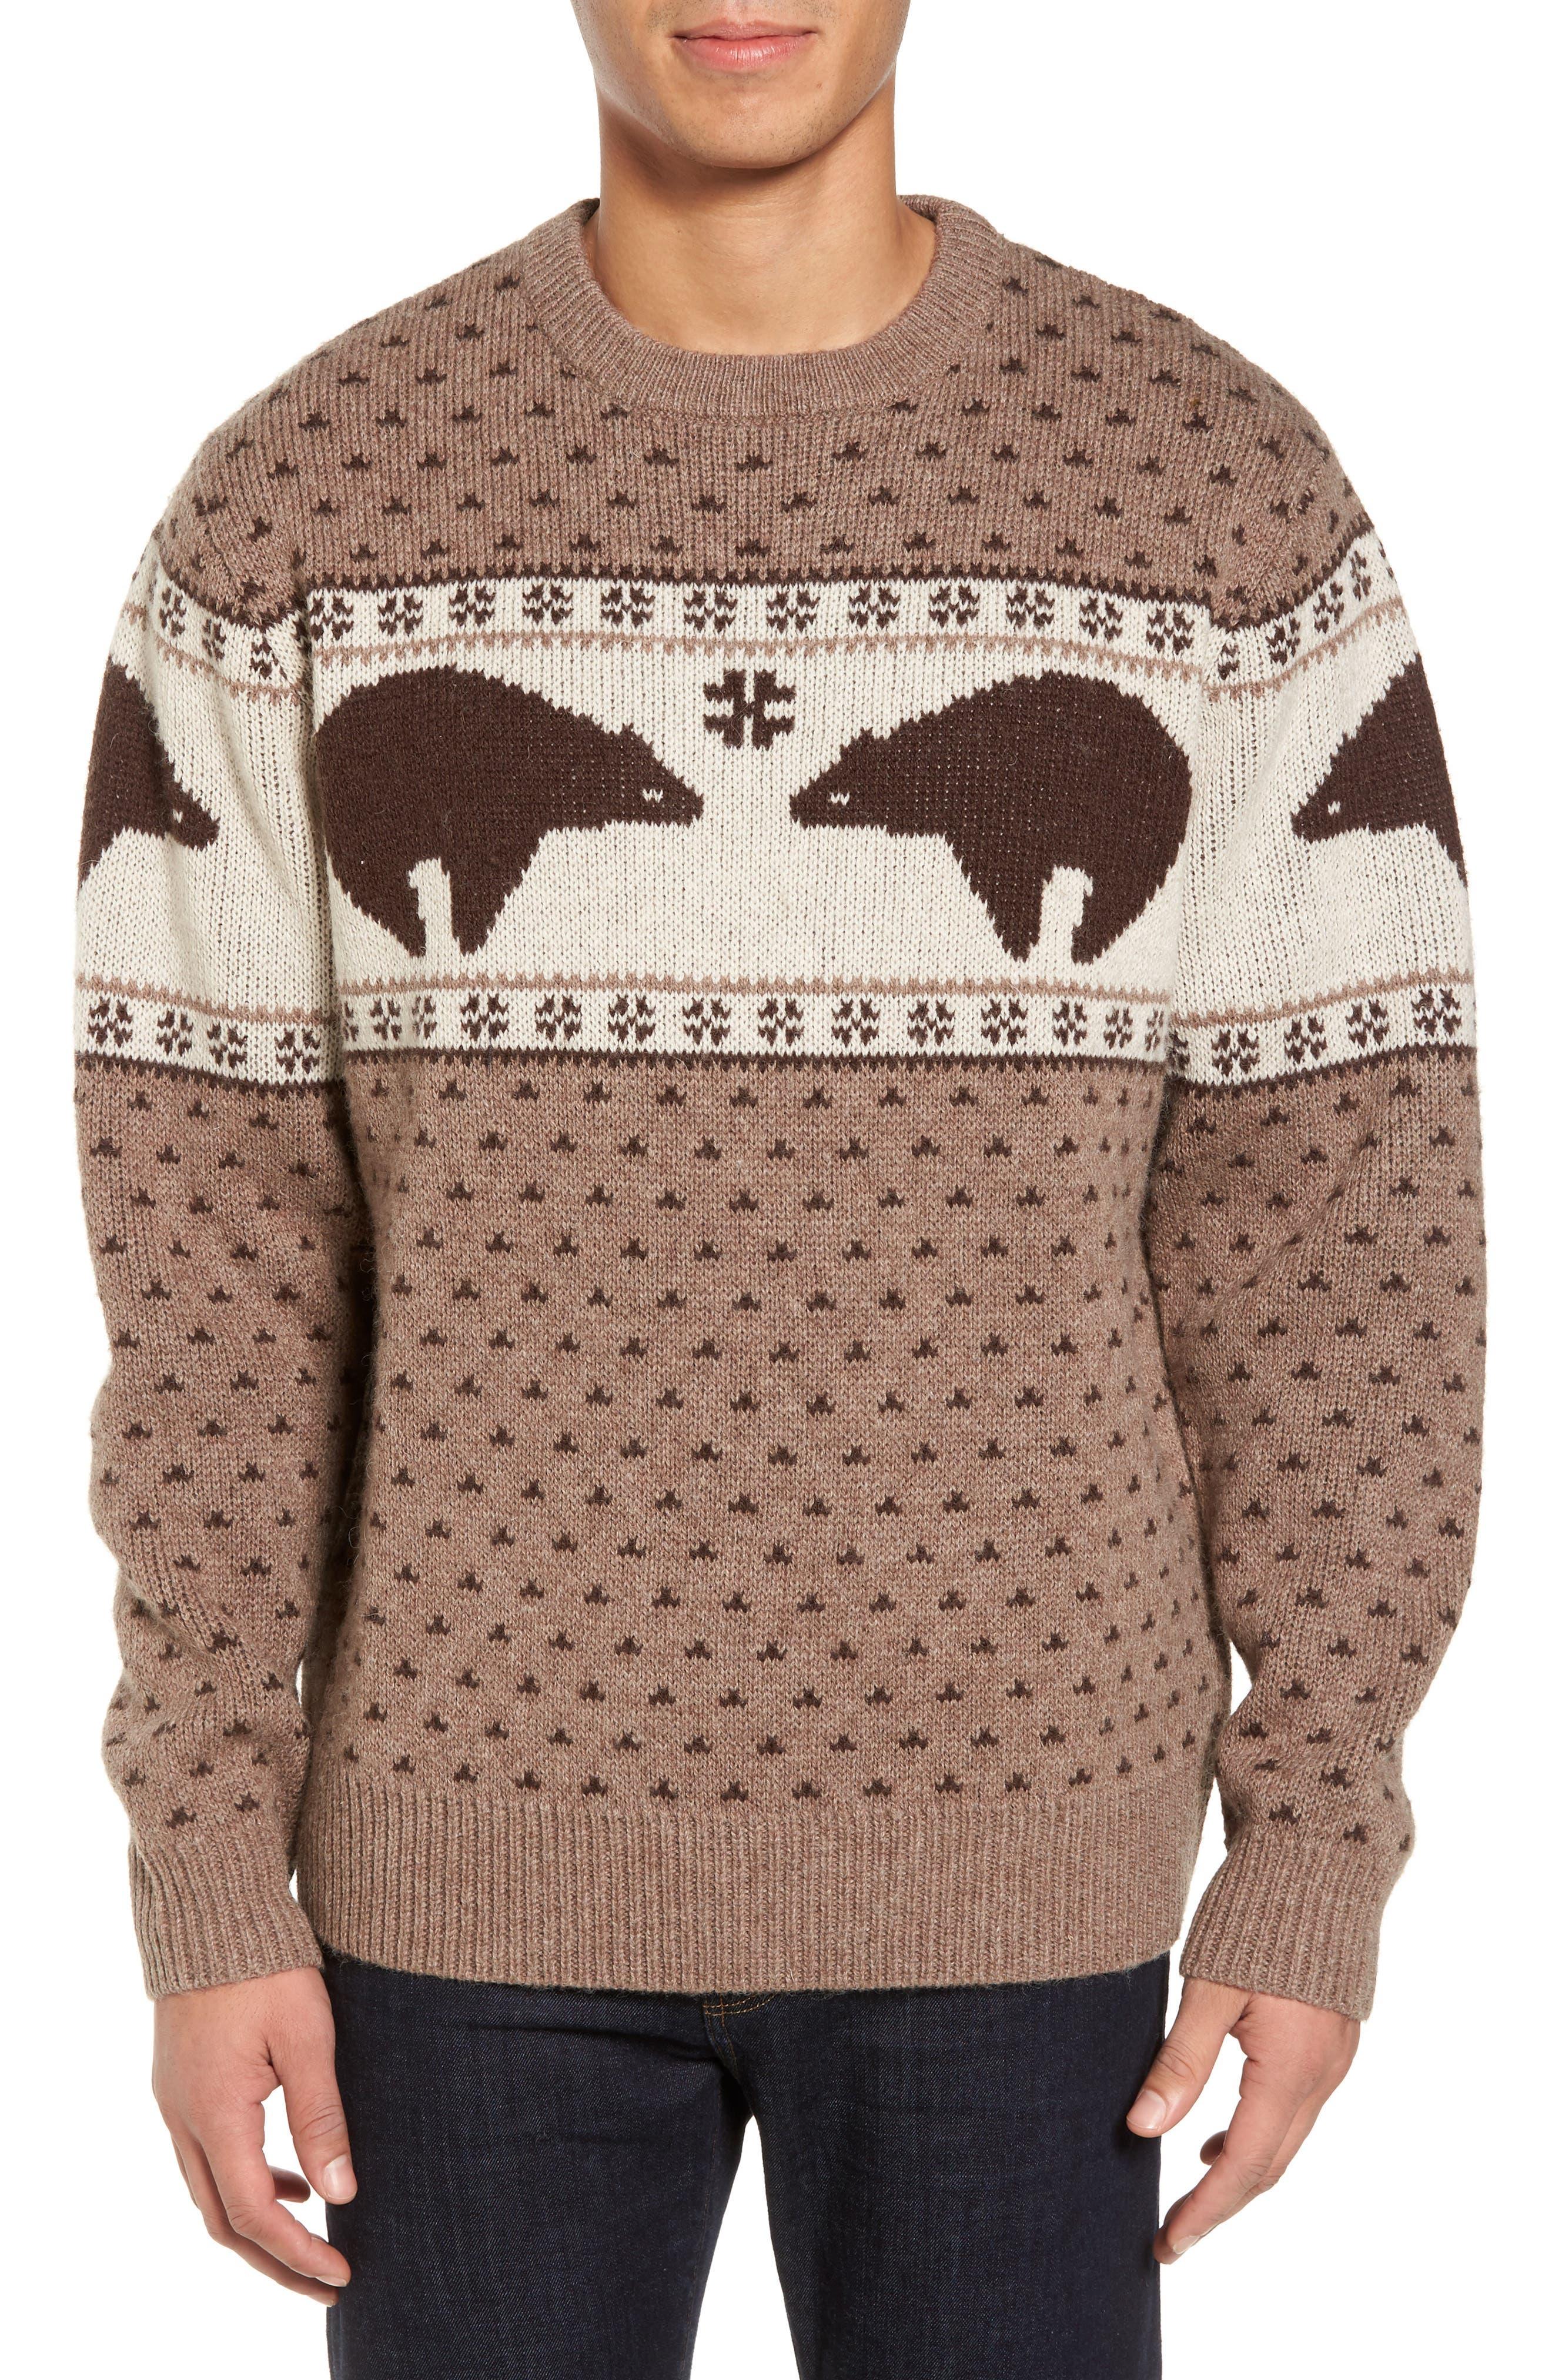 Bear Sweater,                         Main,                         color, Brown/ Ivory Bear